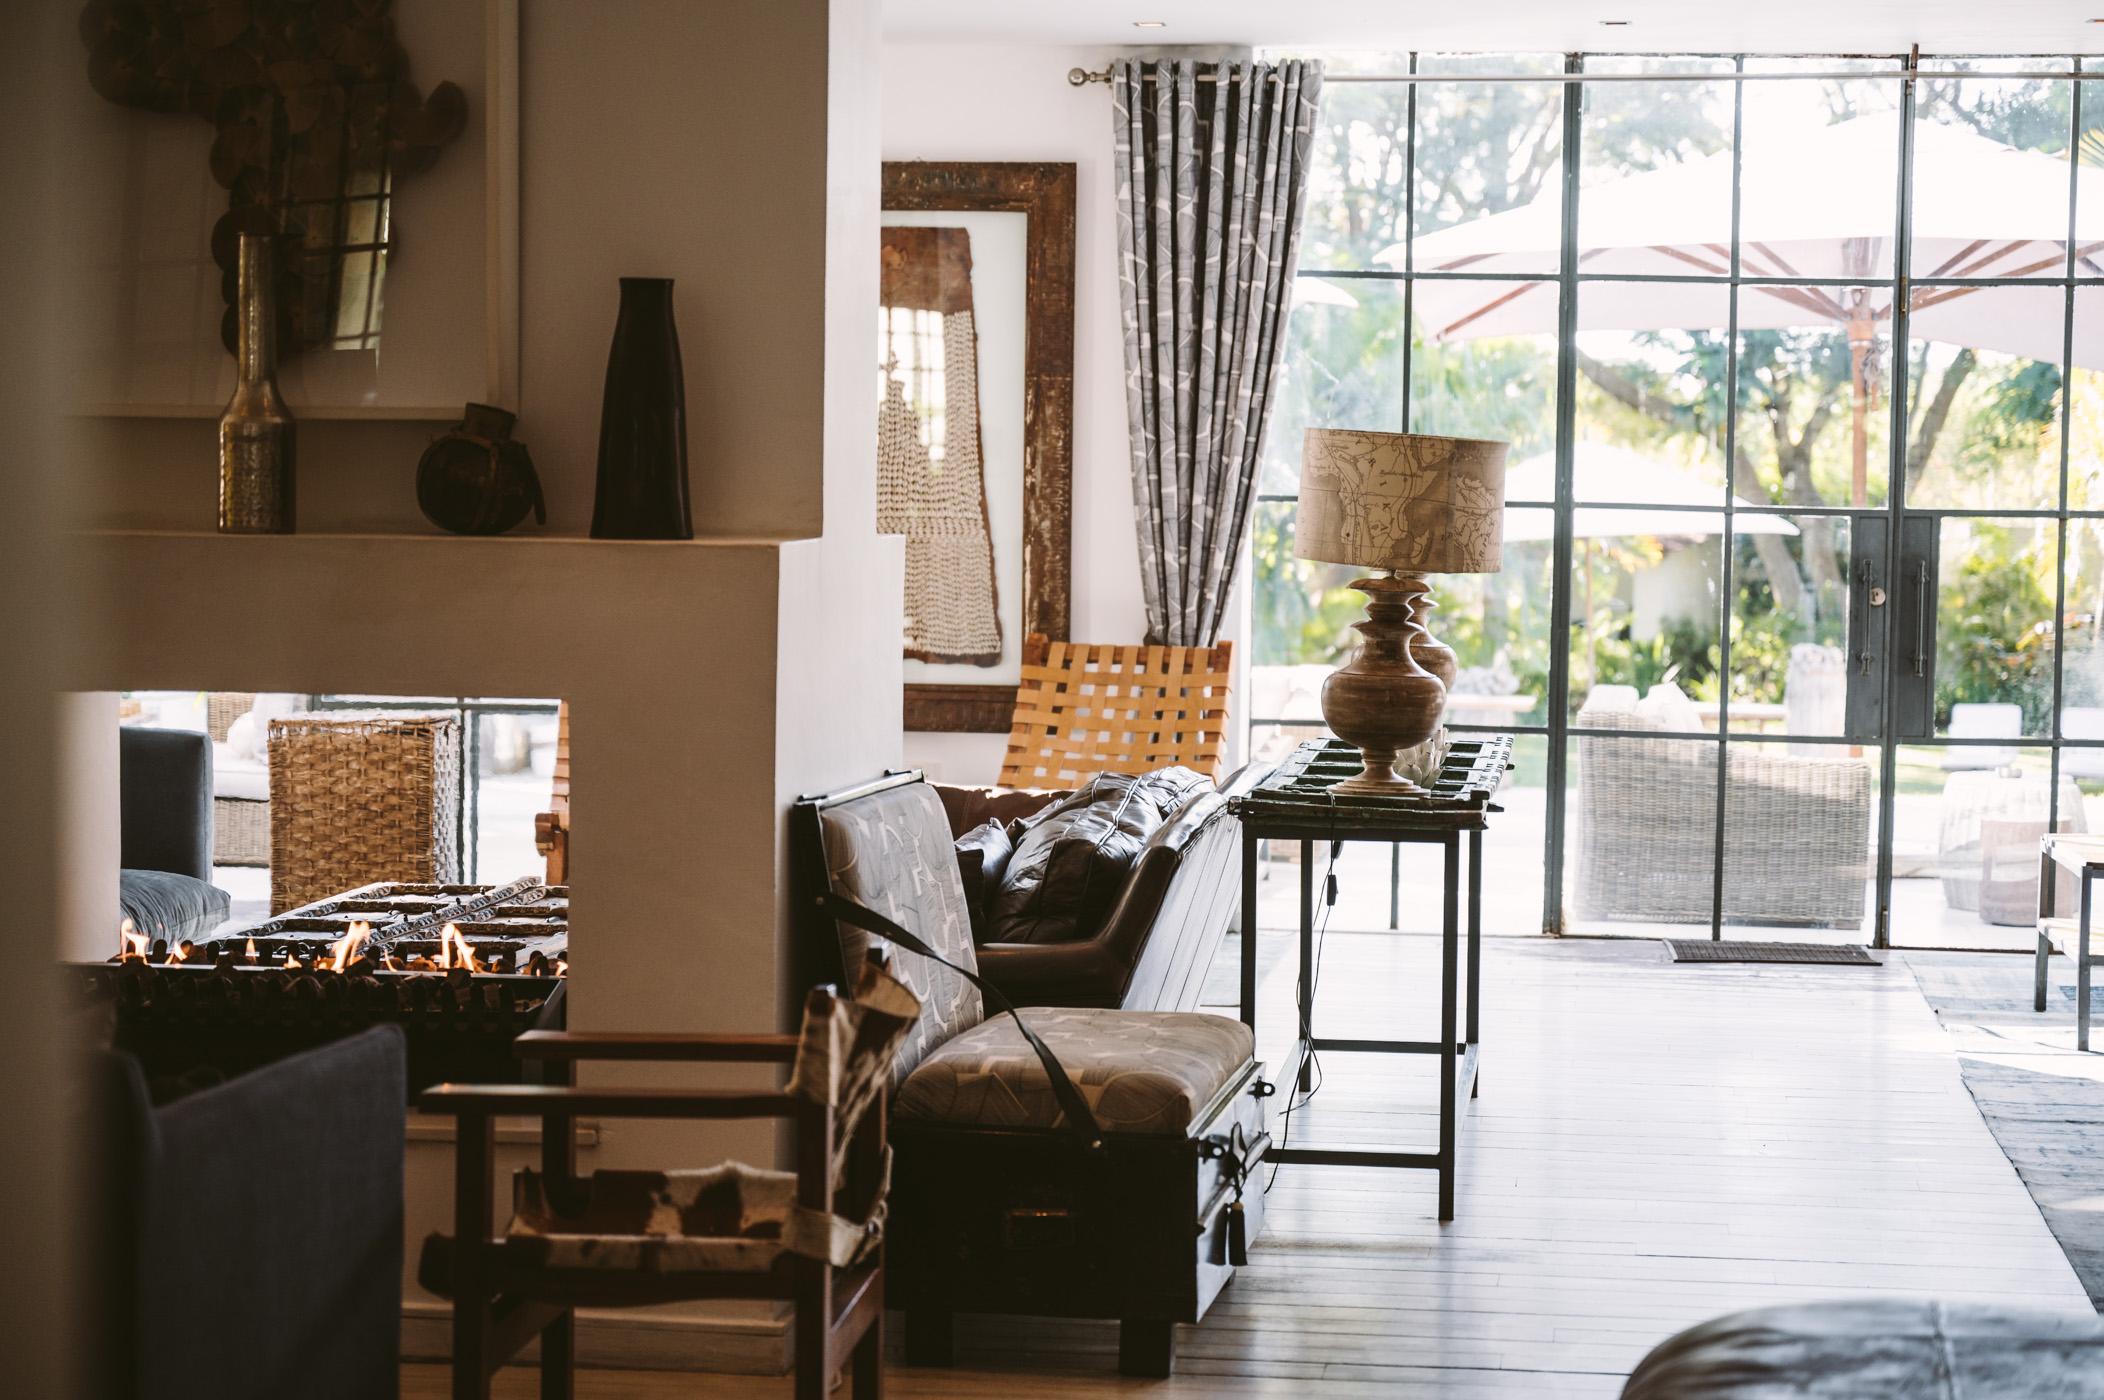 Latitude 15 hotel in Lusaka Zambia